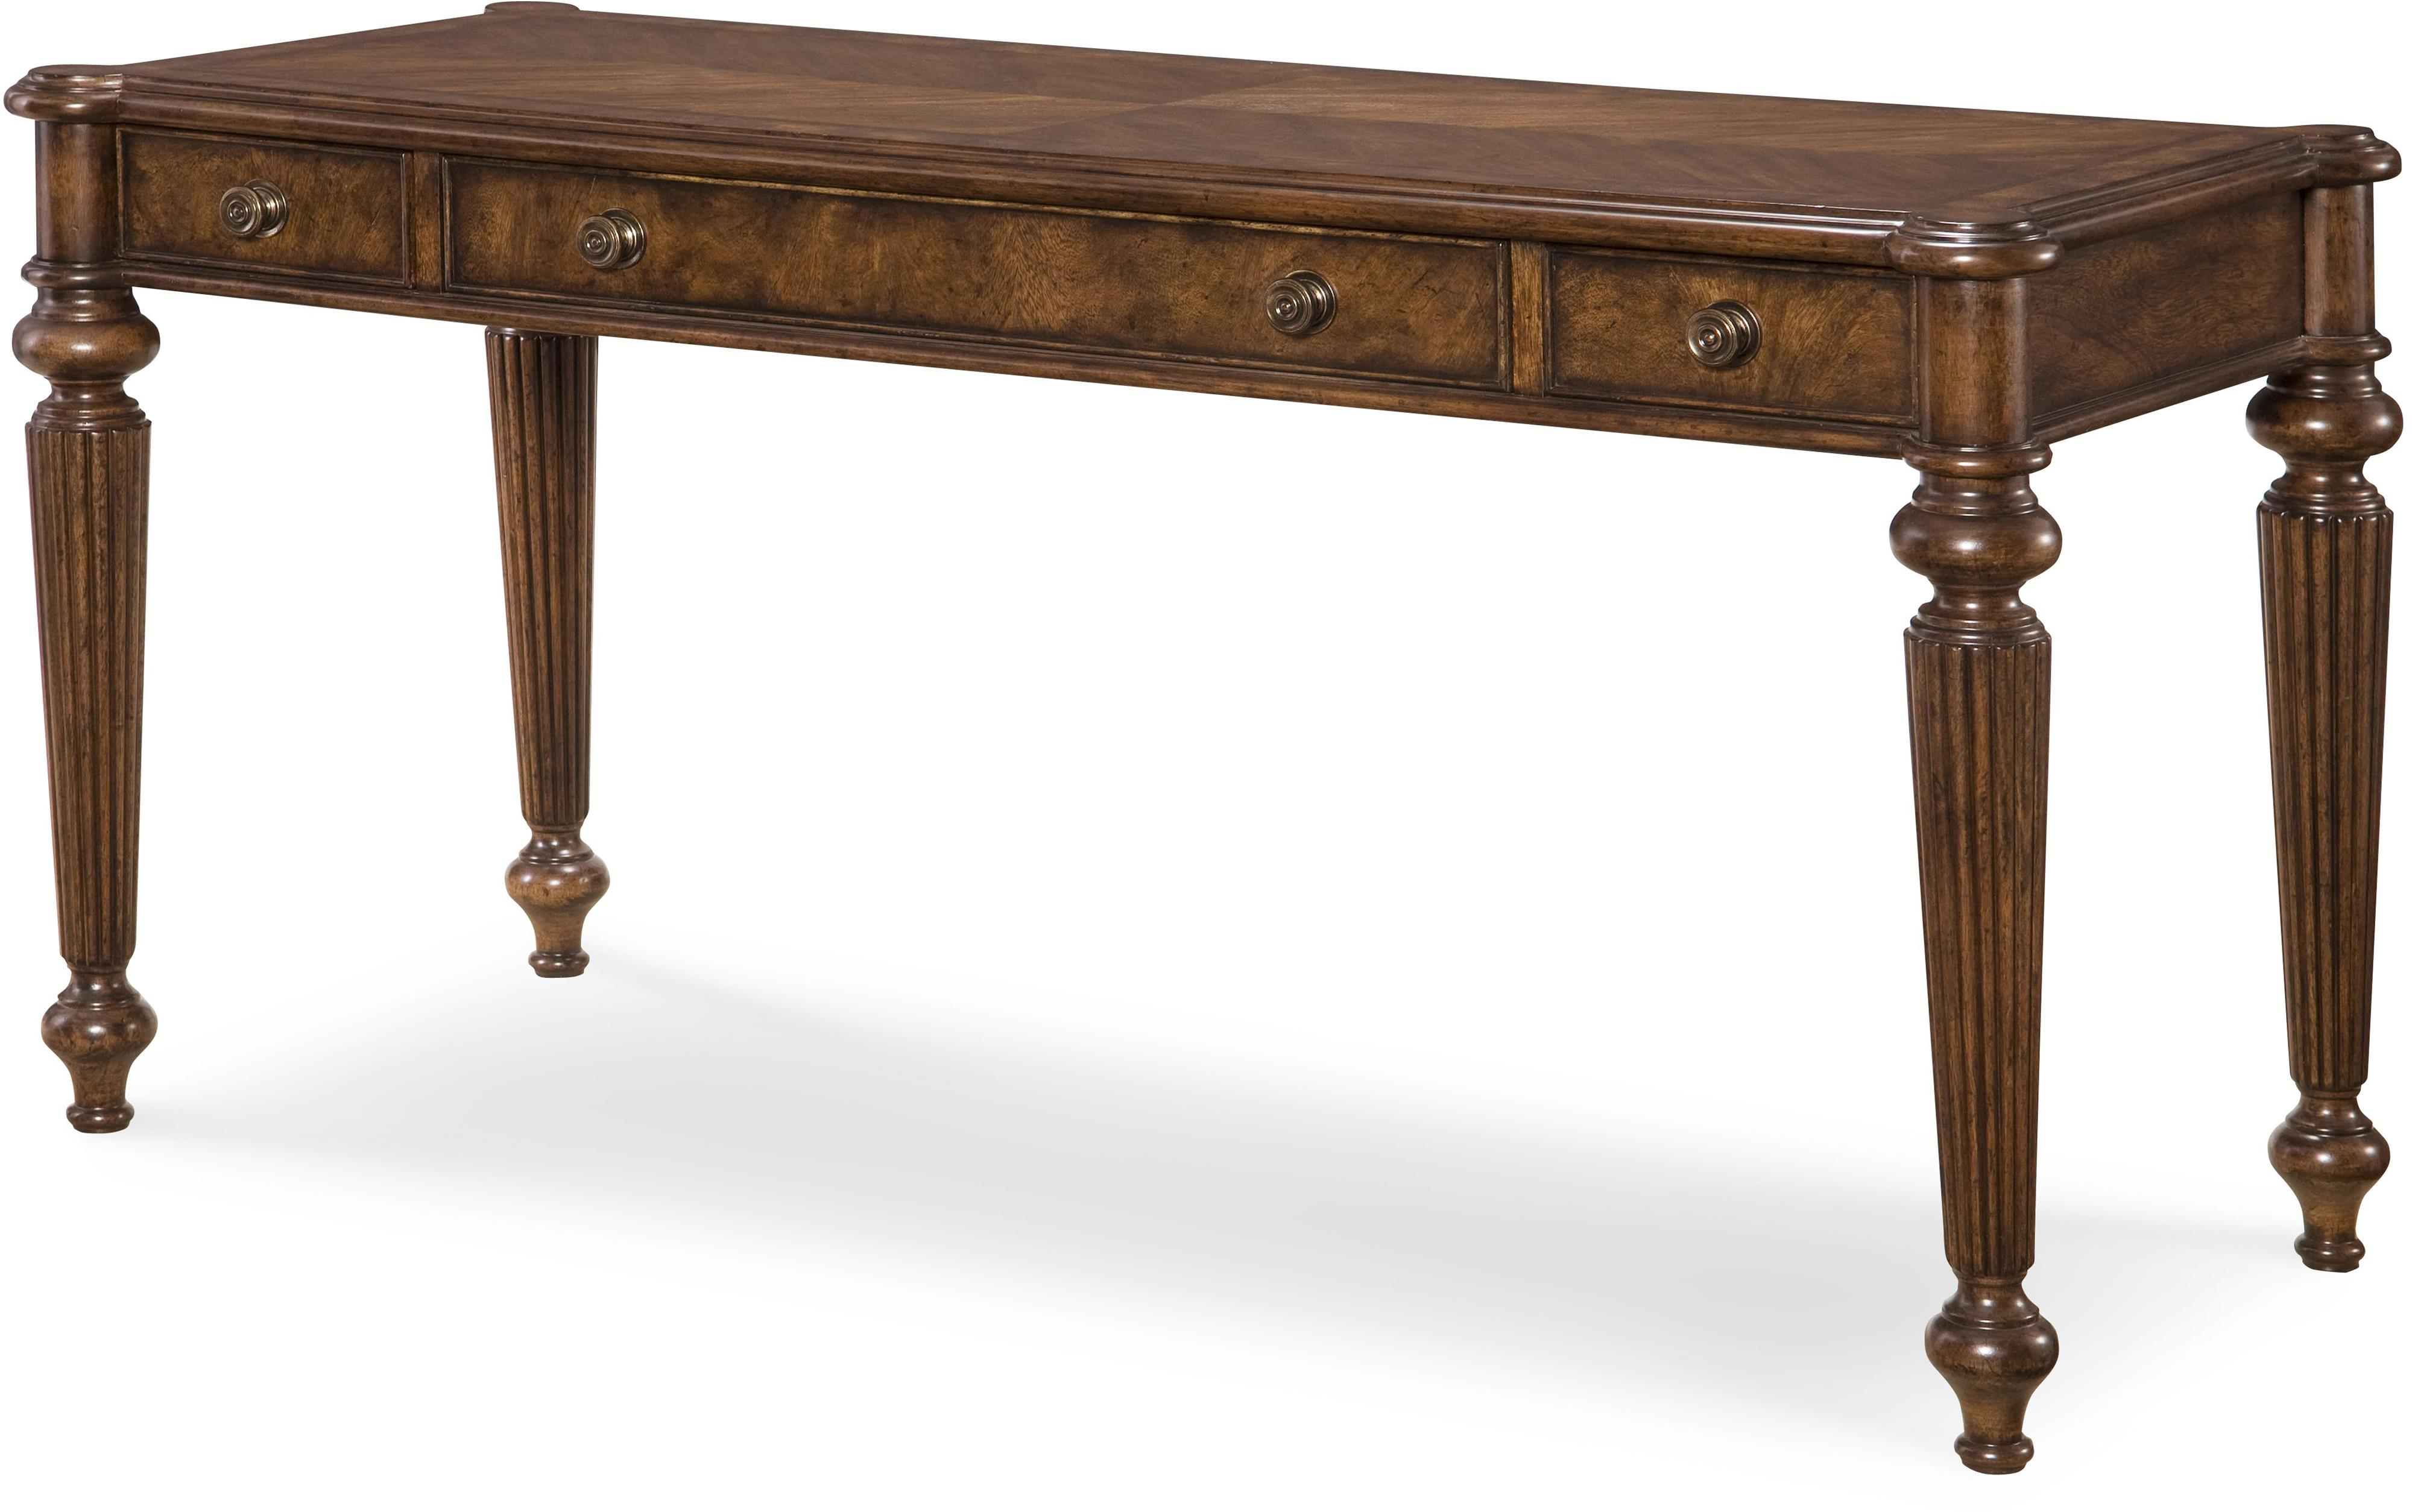 Legacy Classic Barrington Farm Writing Desk  - Item Number: 5200-509